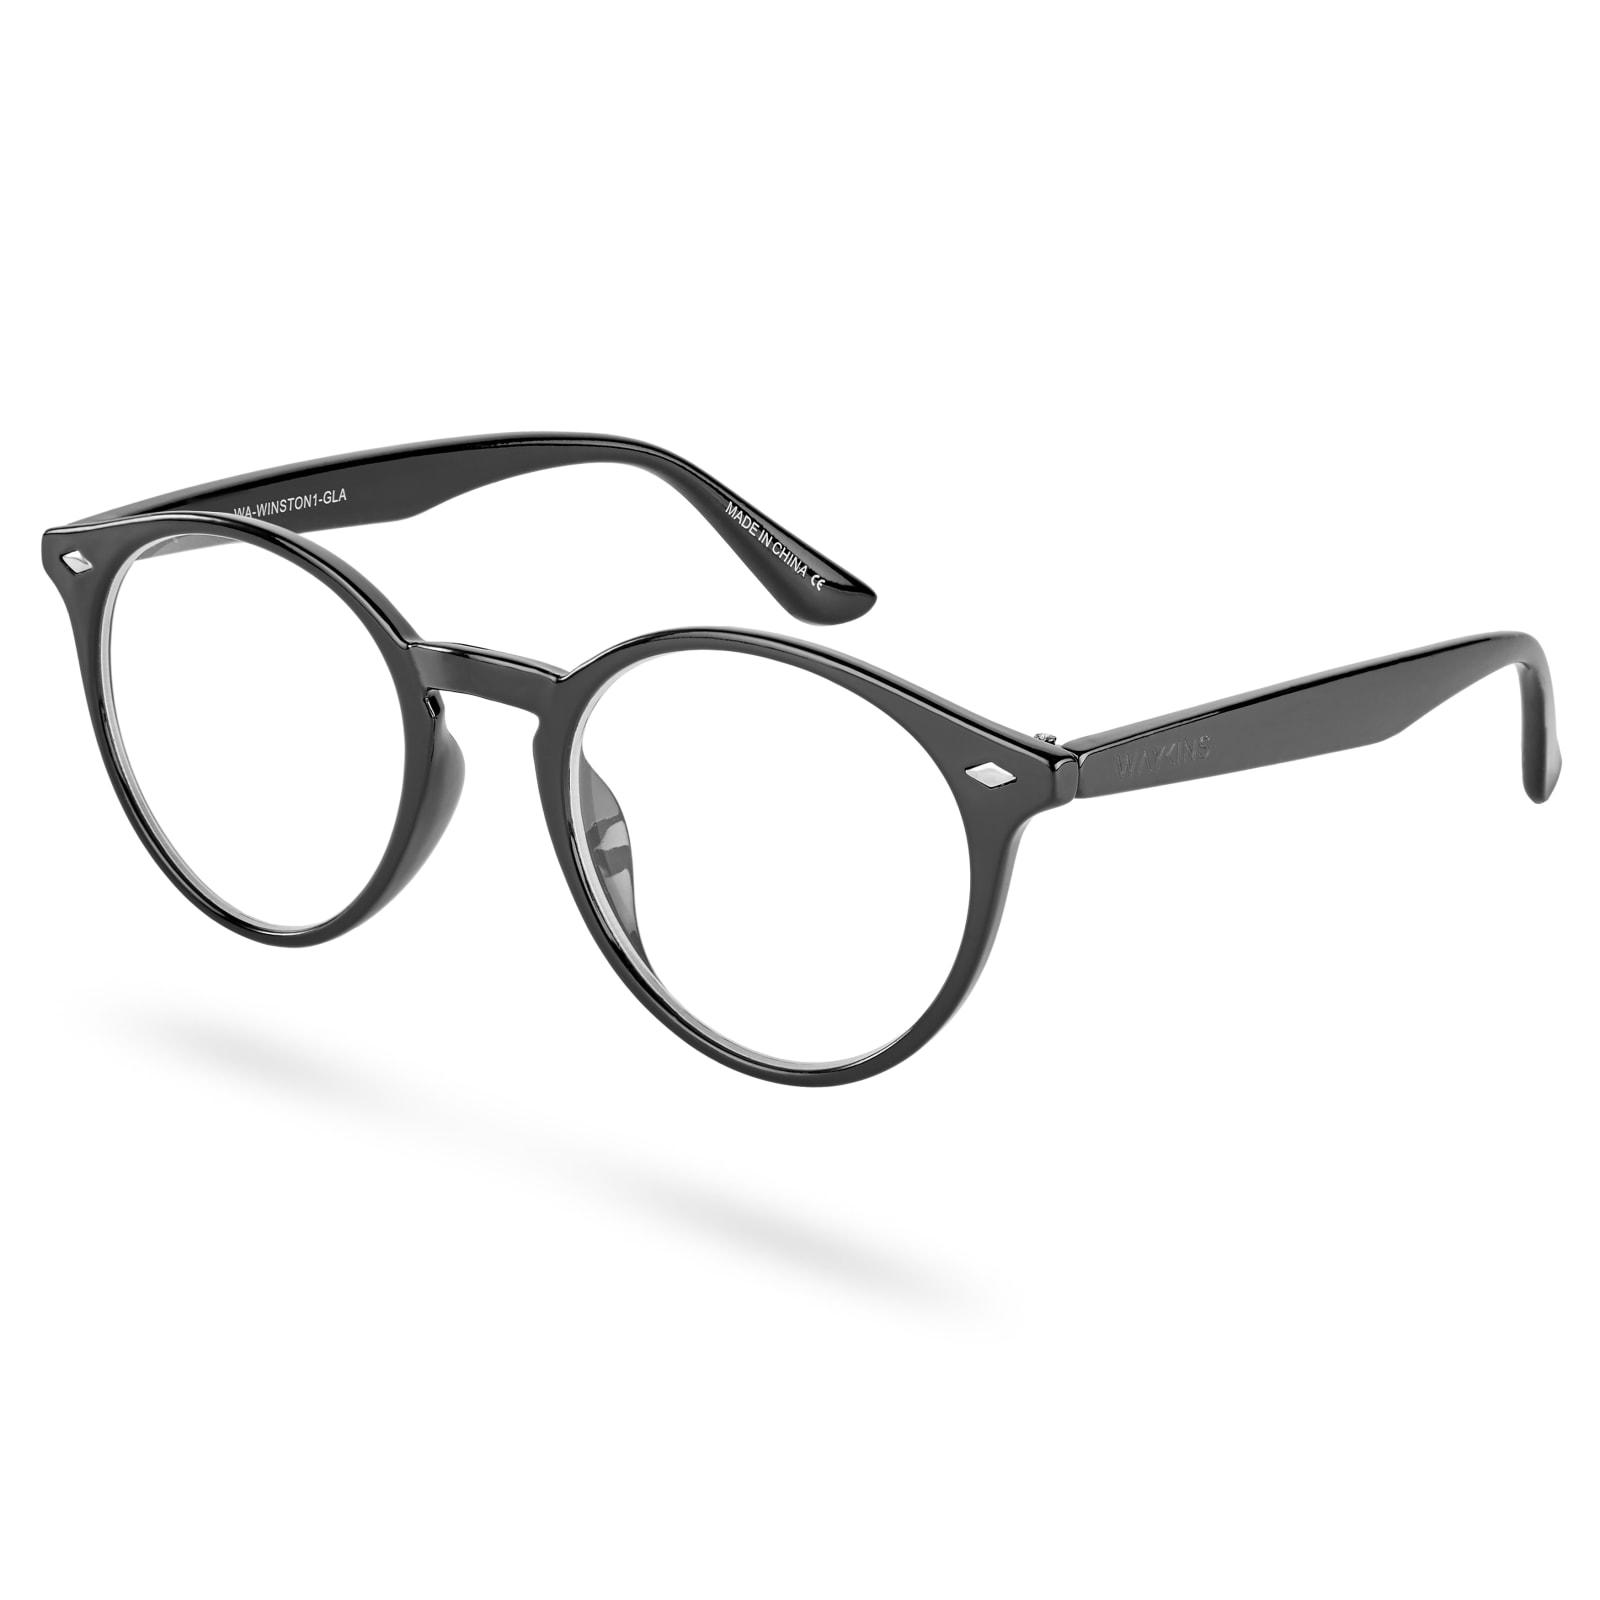 cb8c5f4d4 Čierne okuliare s čírymi šošovkami Winston   Doručenie zdarma   Waykins